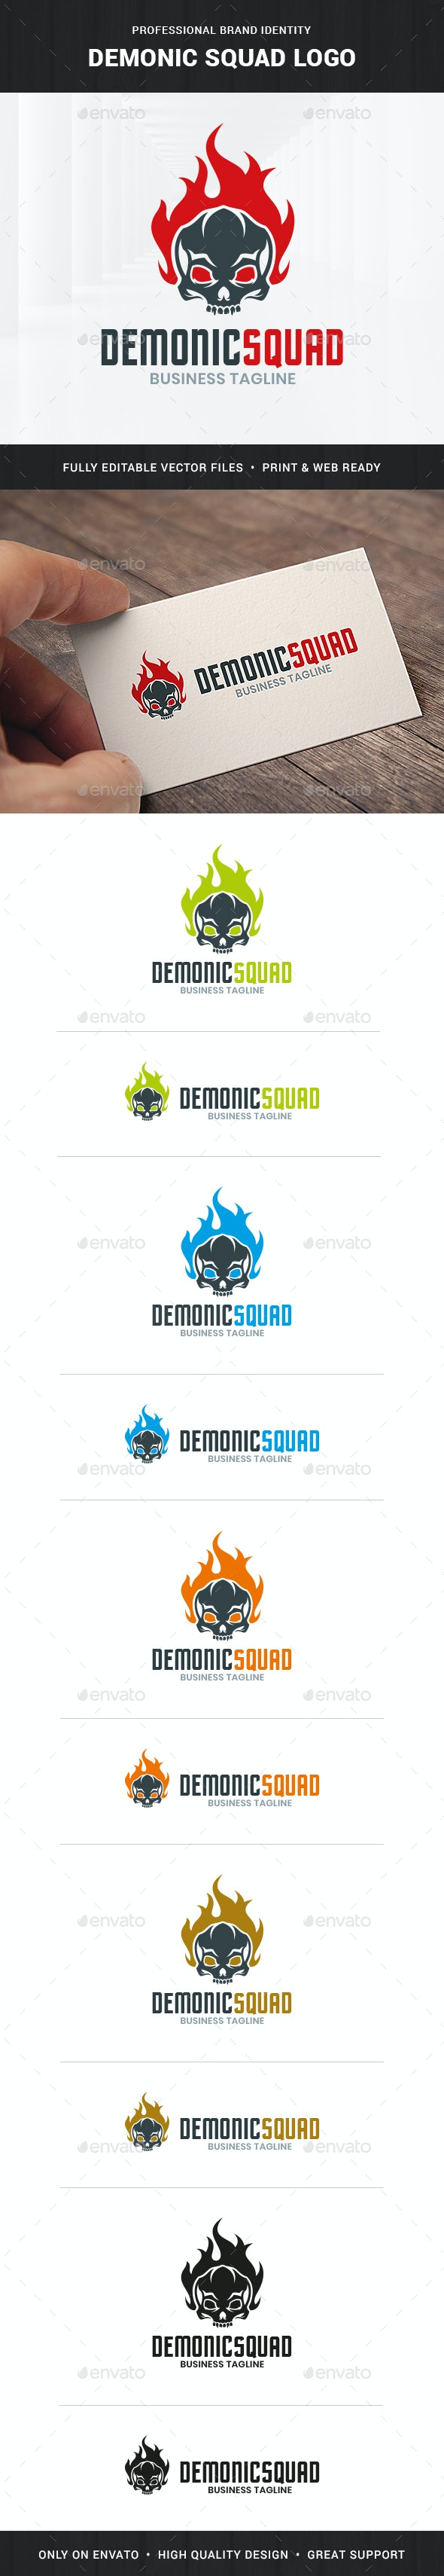 Demonic Squad Logo Template